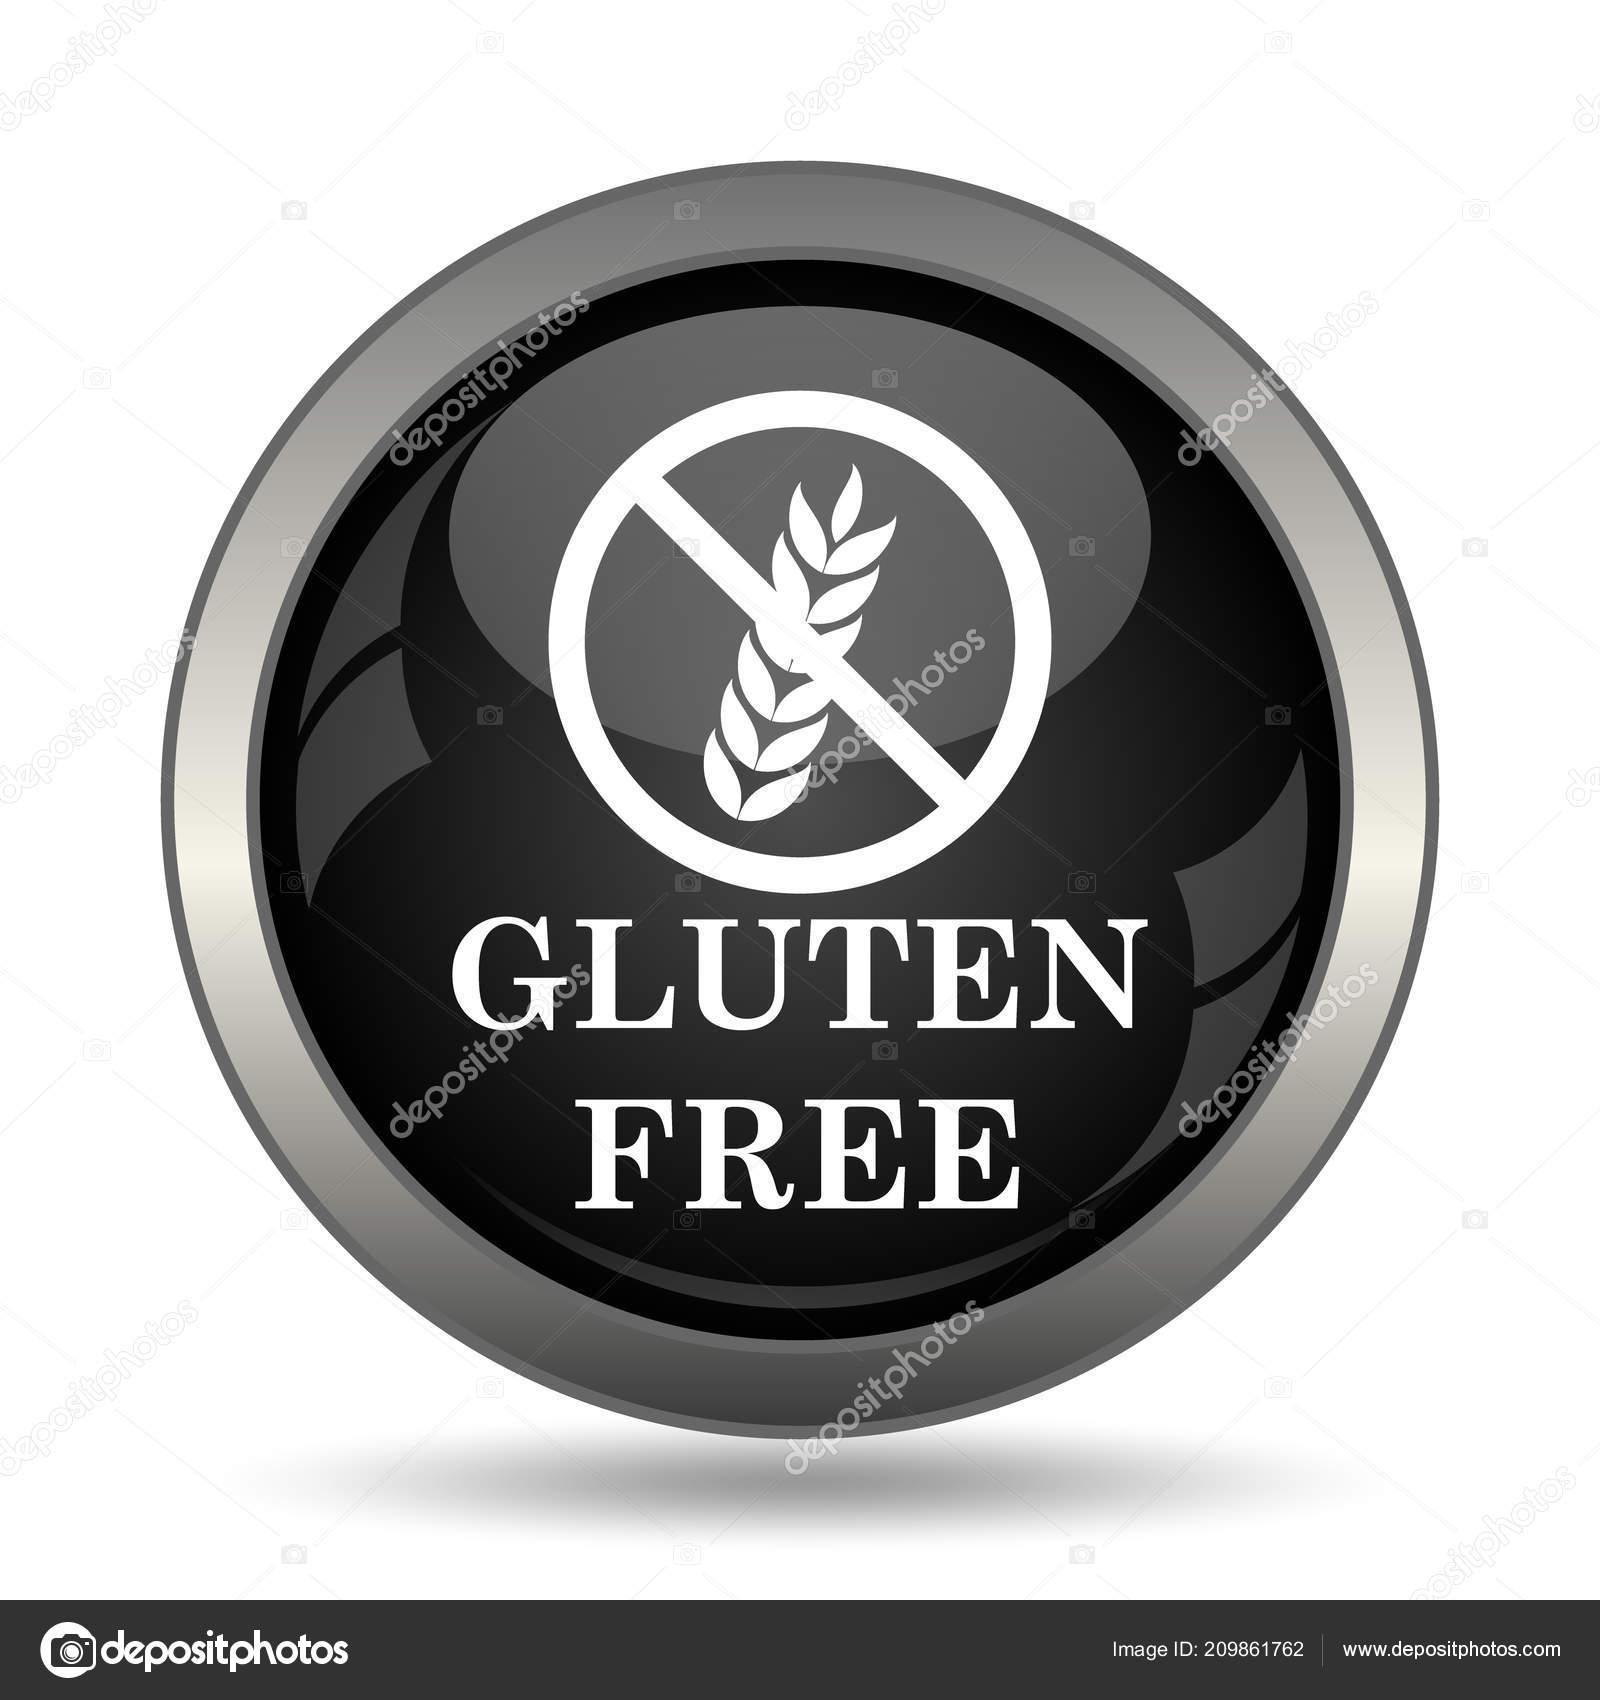 Gluten free icon — Stock Photo © valentint #209861762